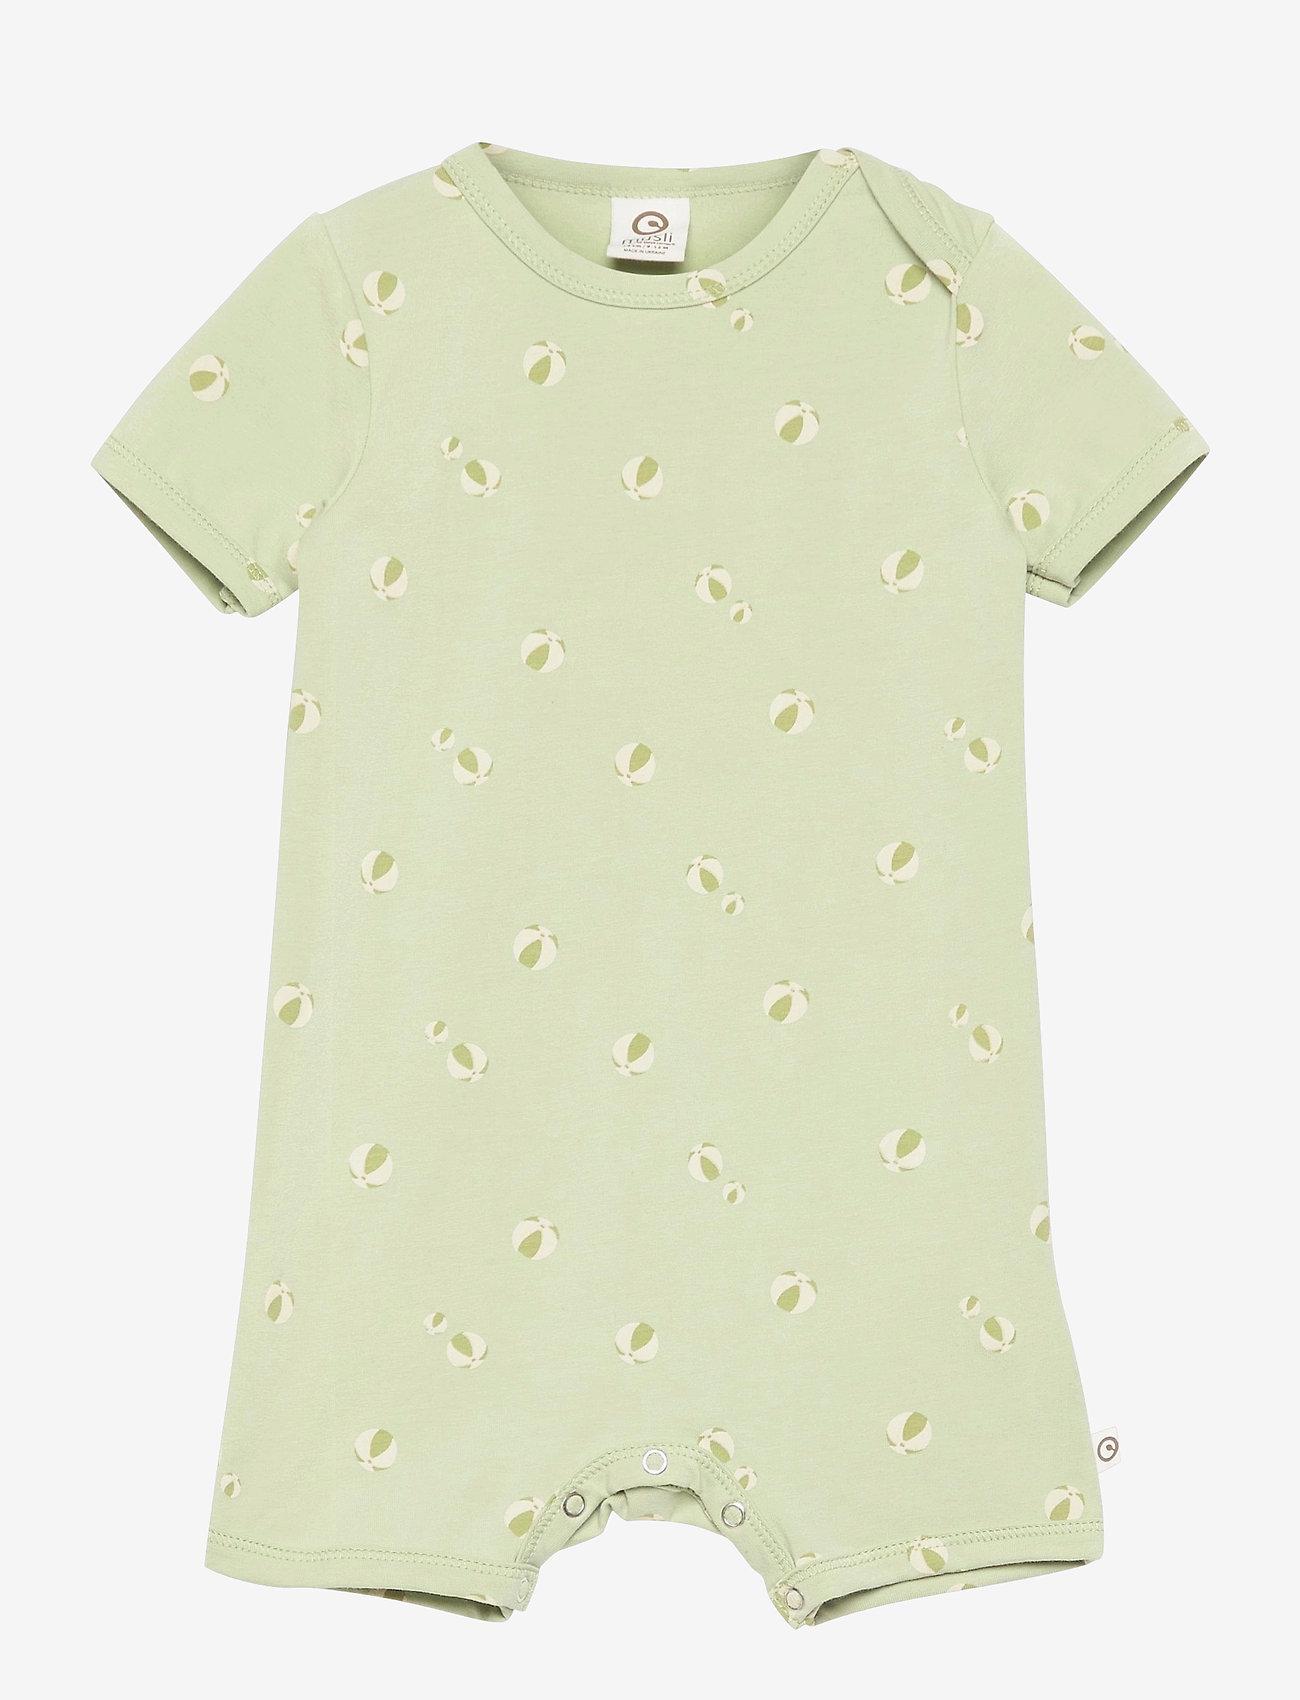 Müsli by Green Cotton - Beachball beach body - kurzärmelig - pale moss - 0